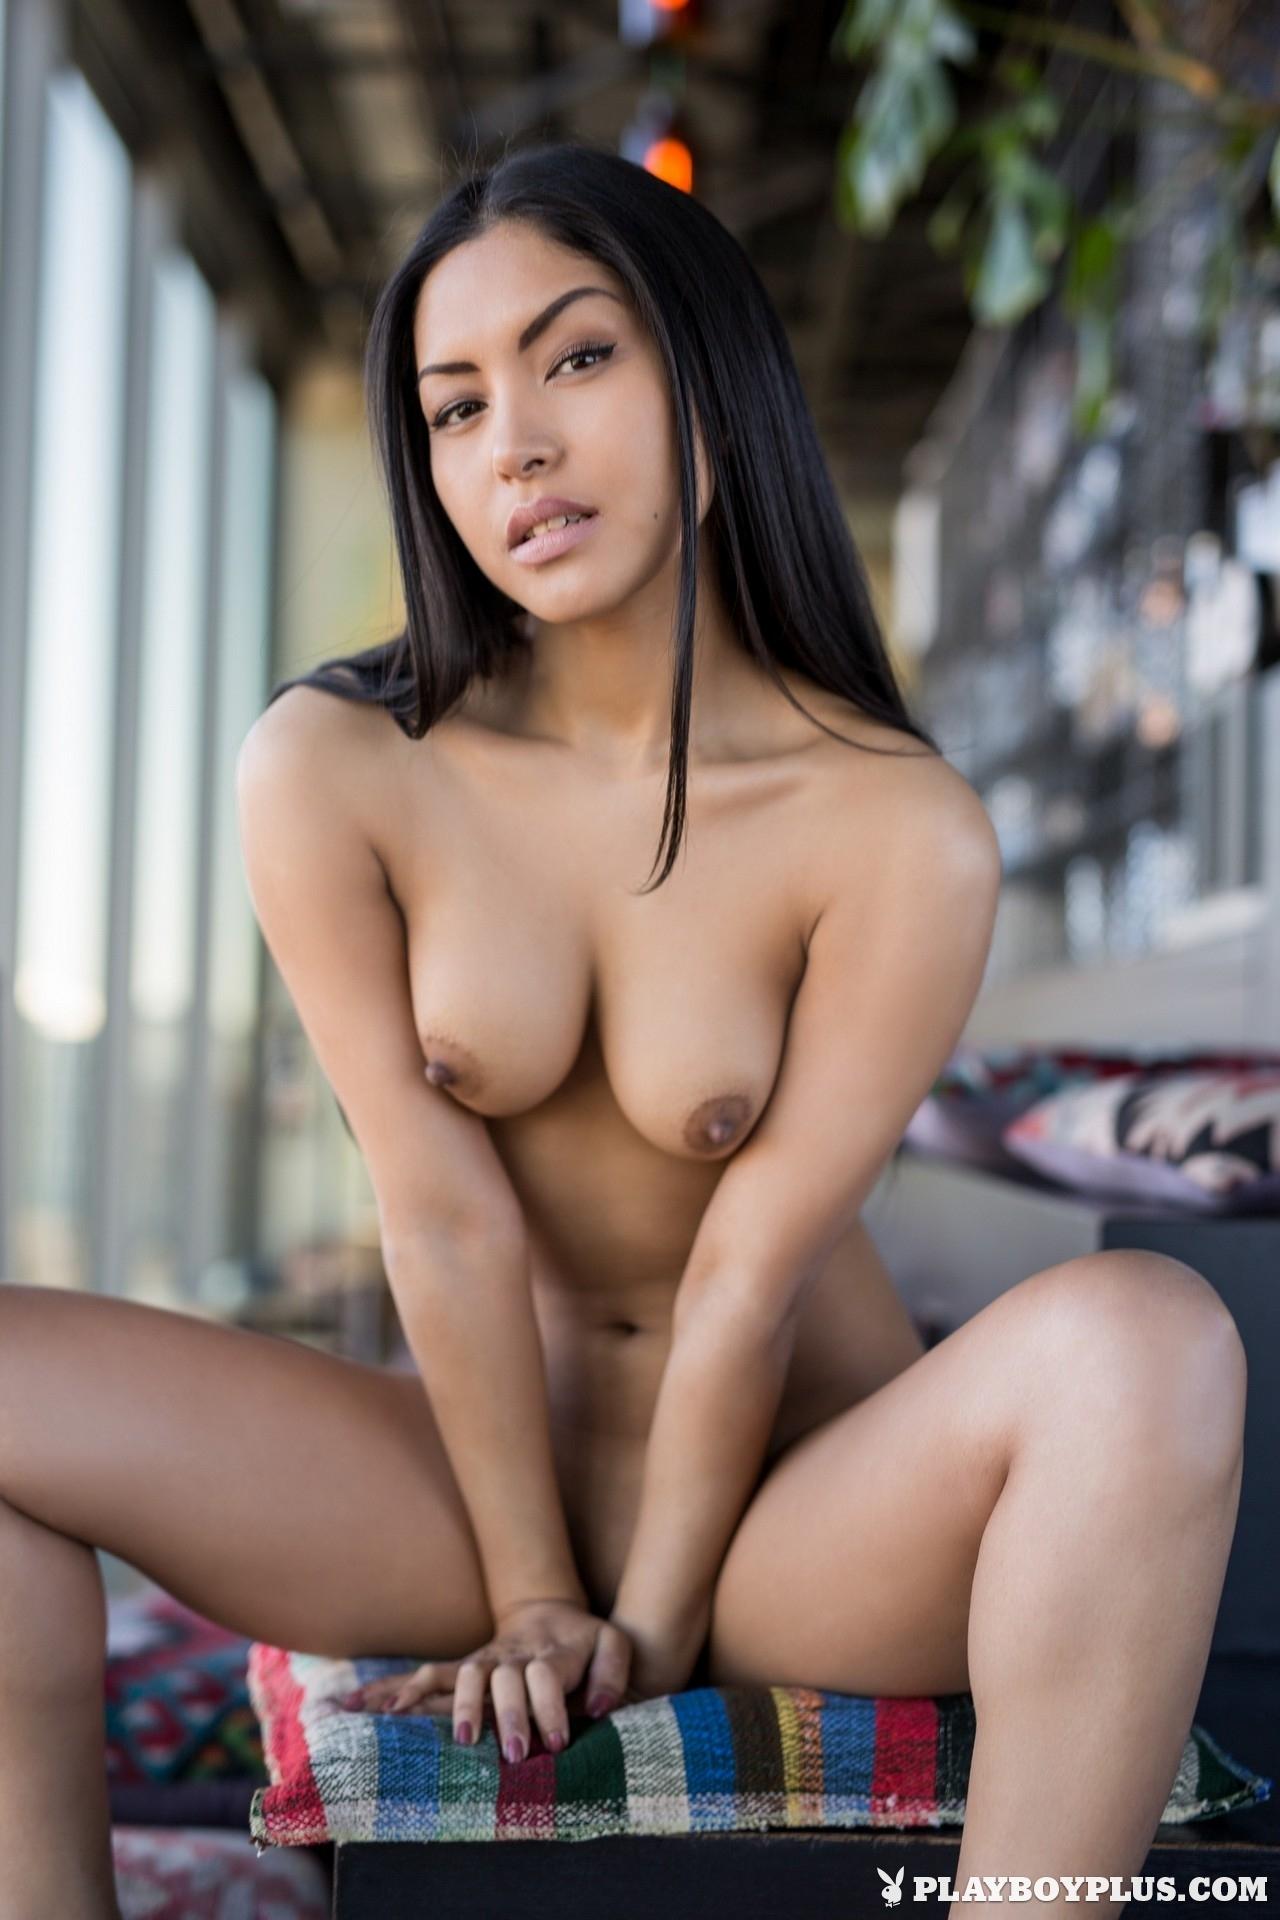 Playboy Plus Chloe Rose In Inspiring View (26)